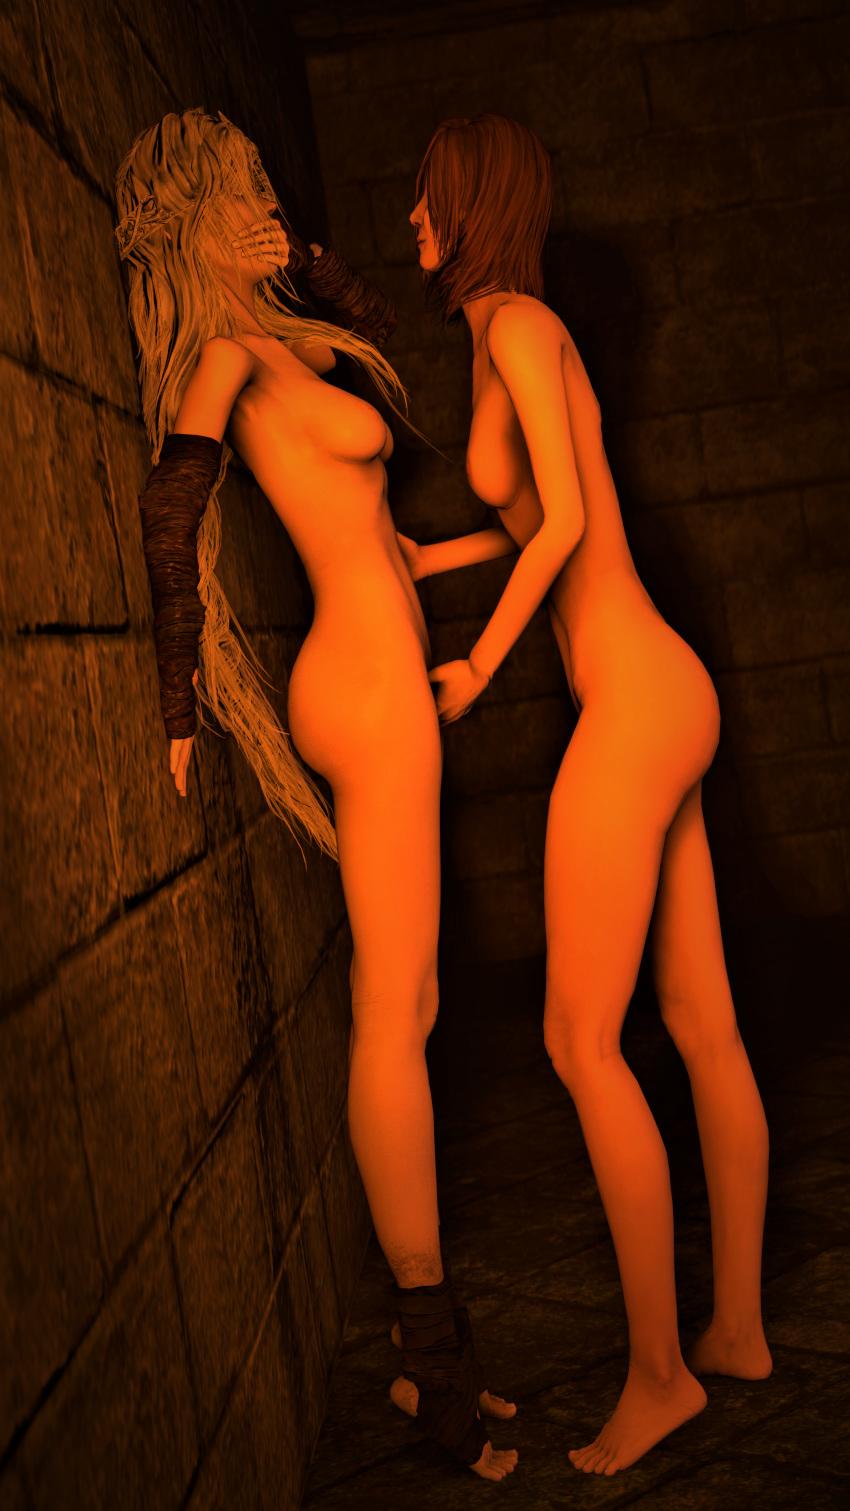 mimic dark hat souls 3 Mr peabody and sherman nude